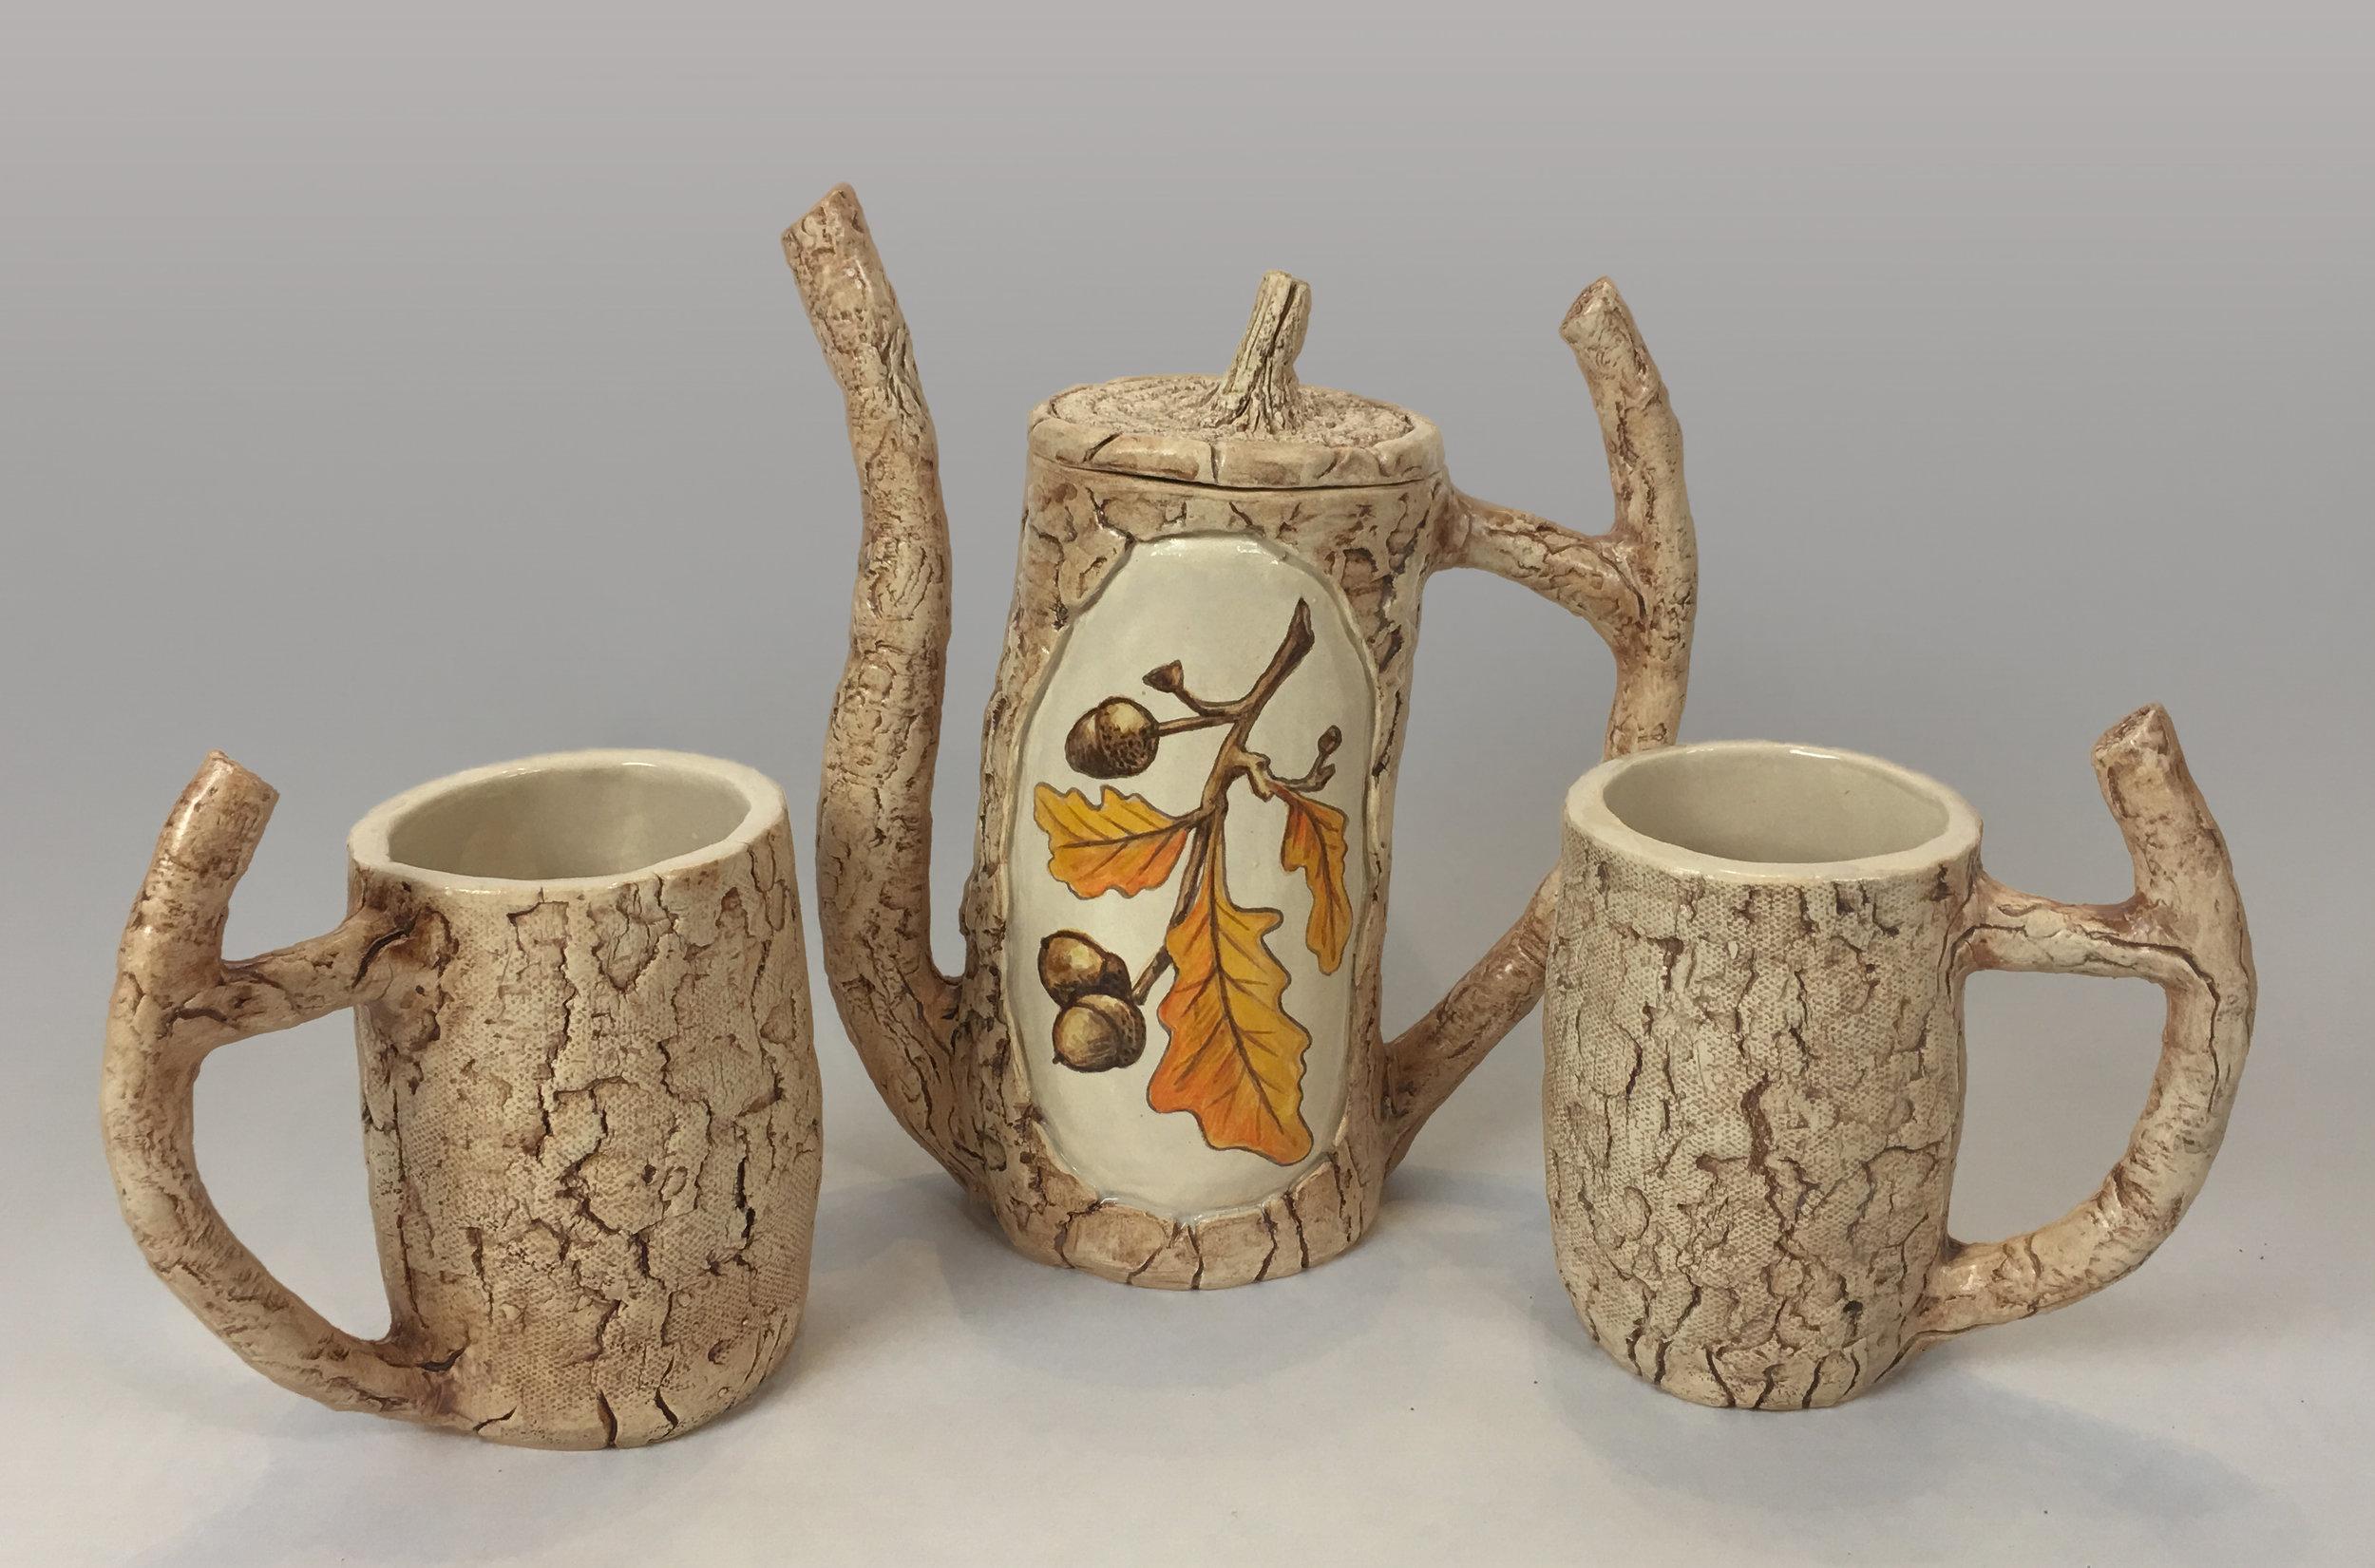 Tea Set with Oak Branch